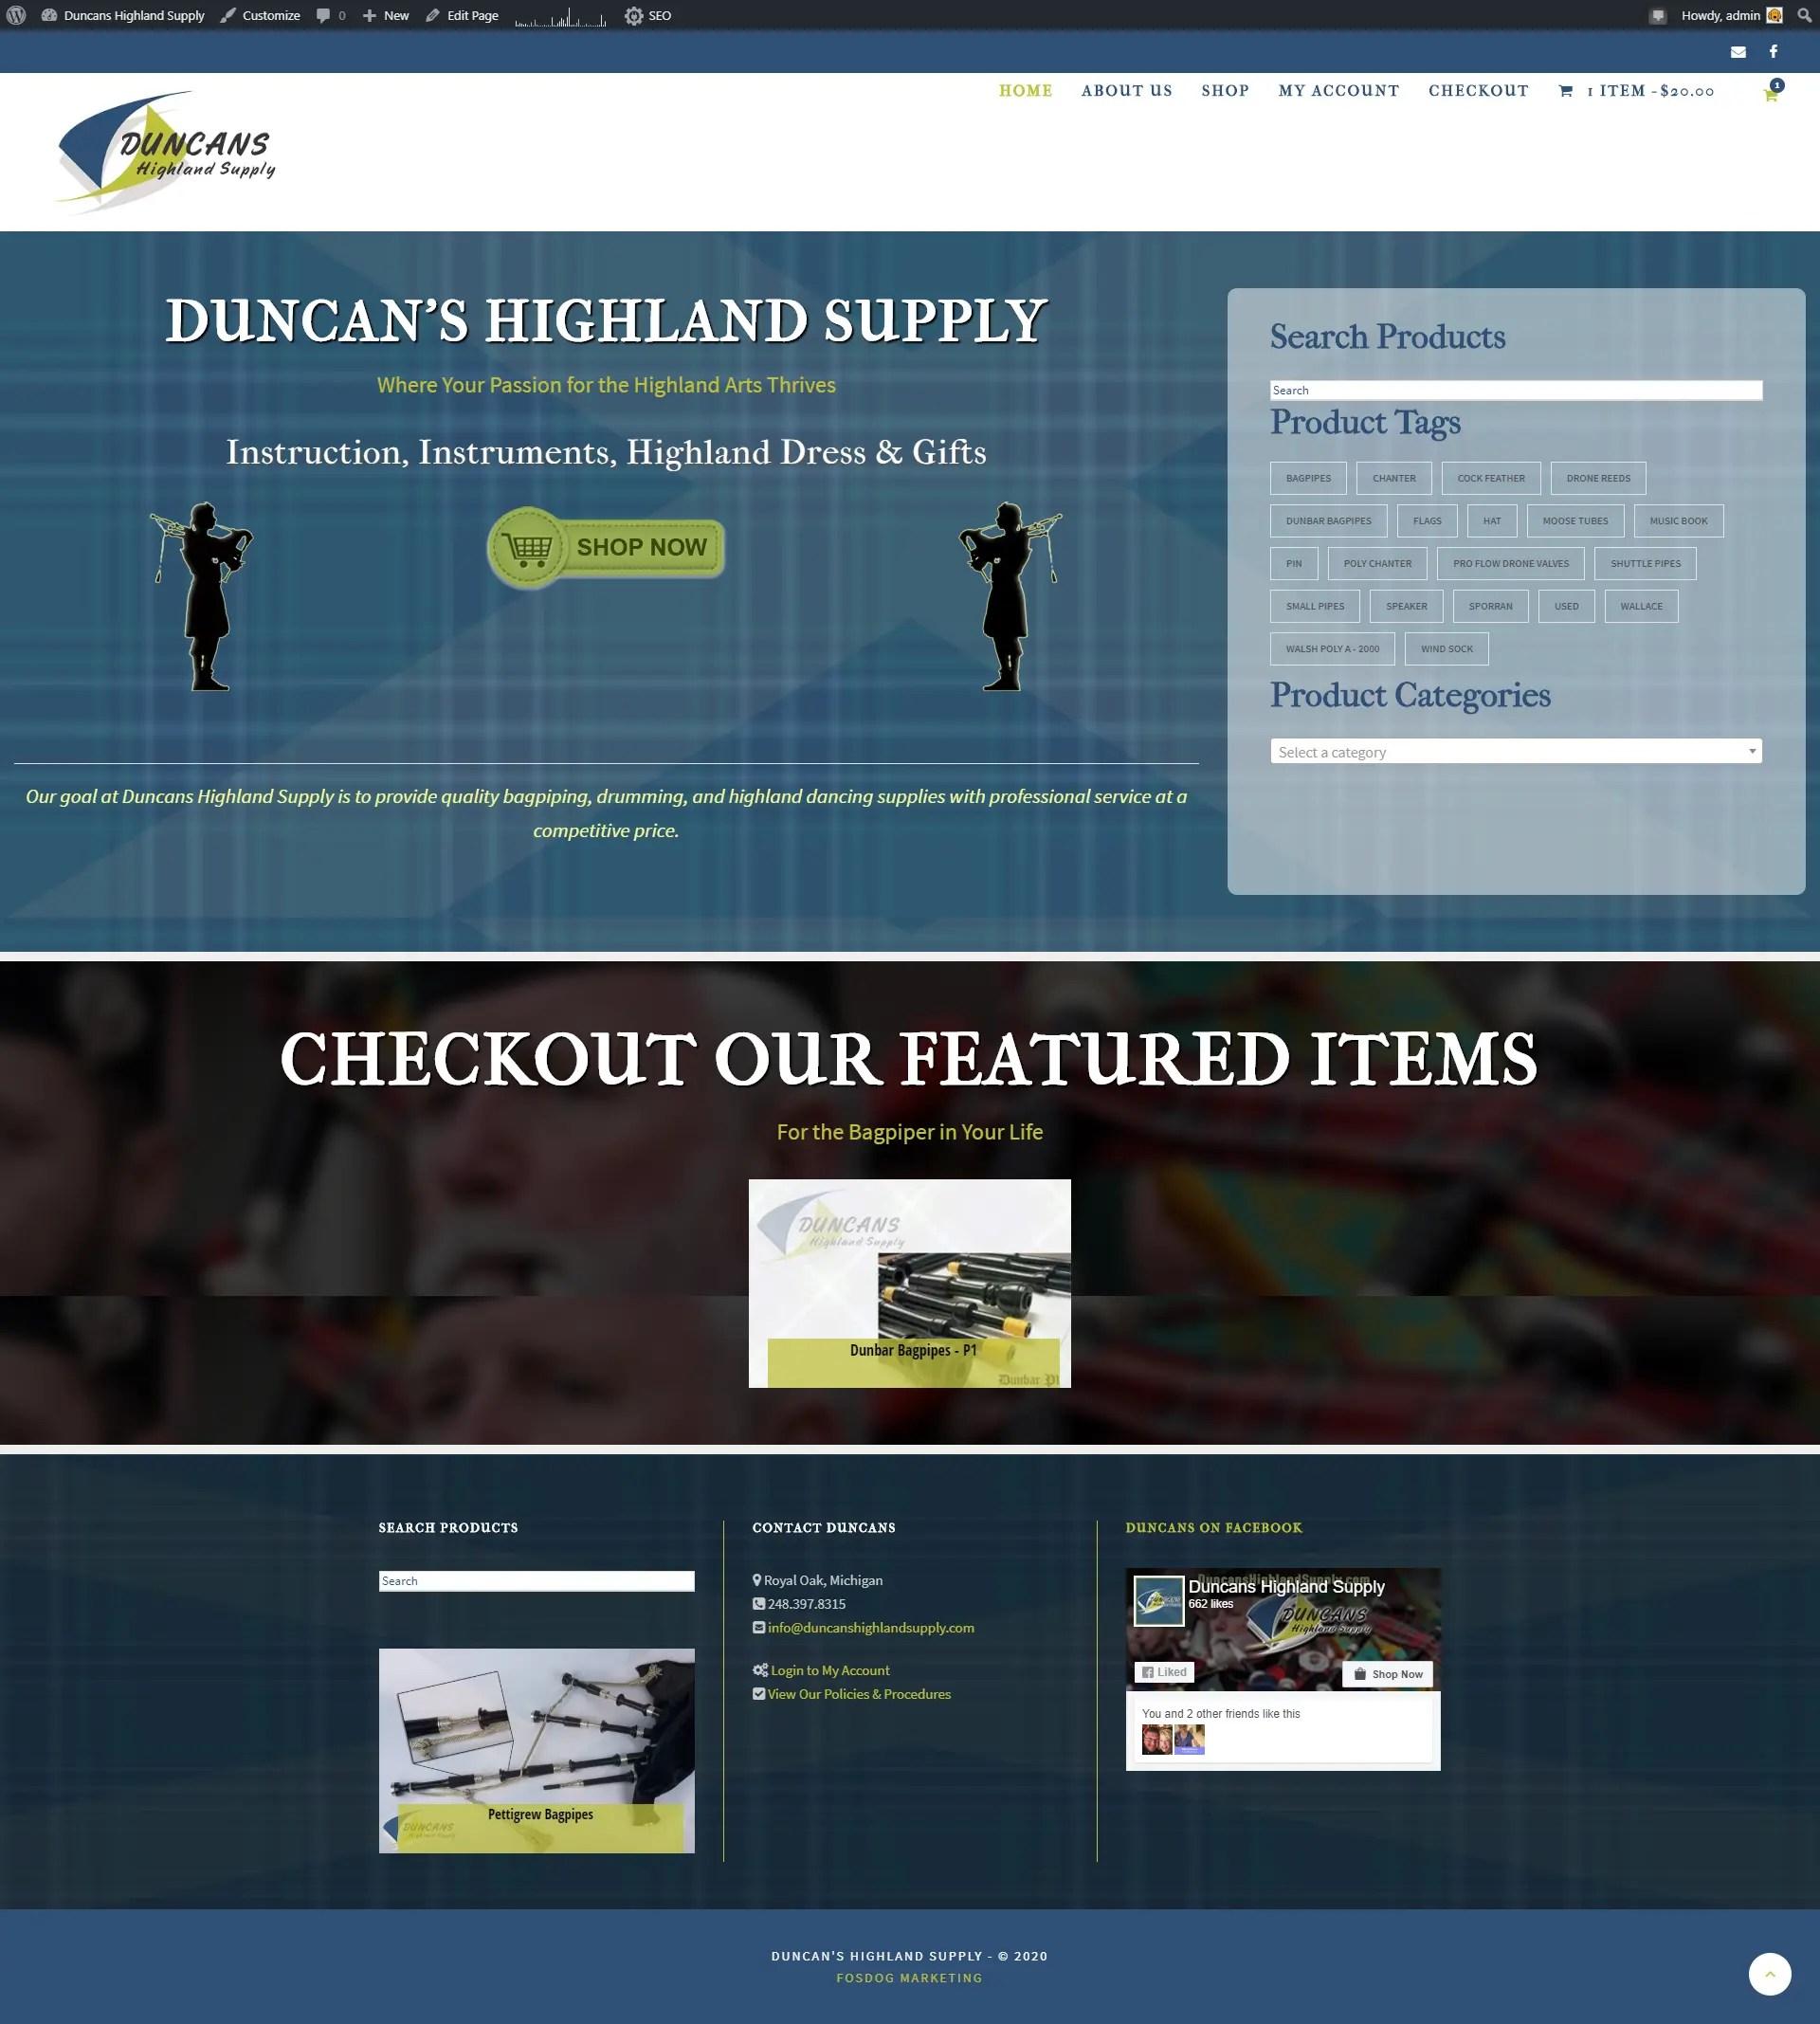 Duncans Highland Supply